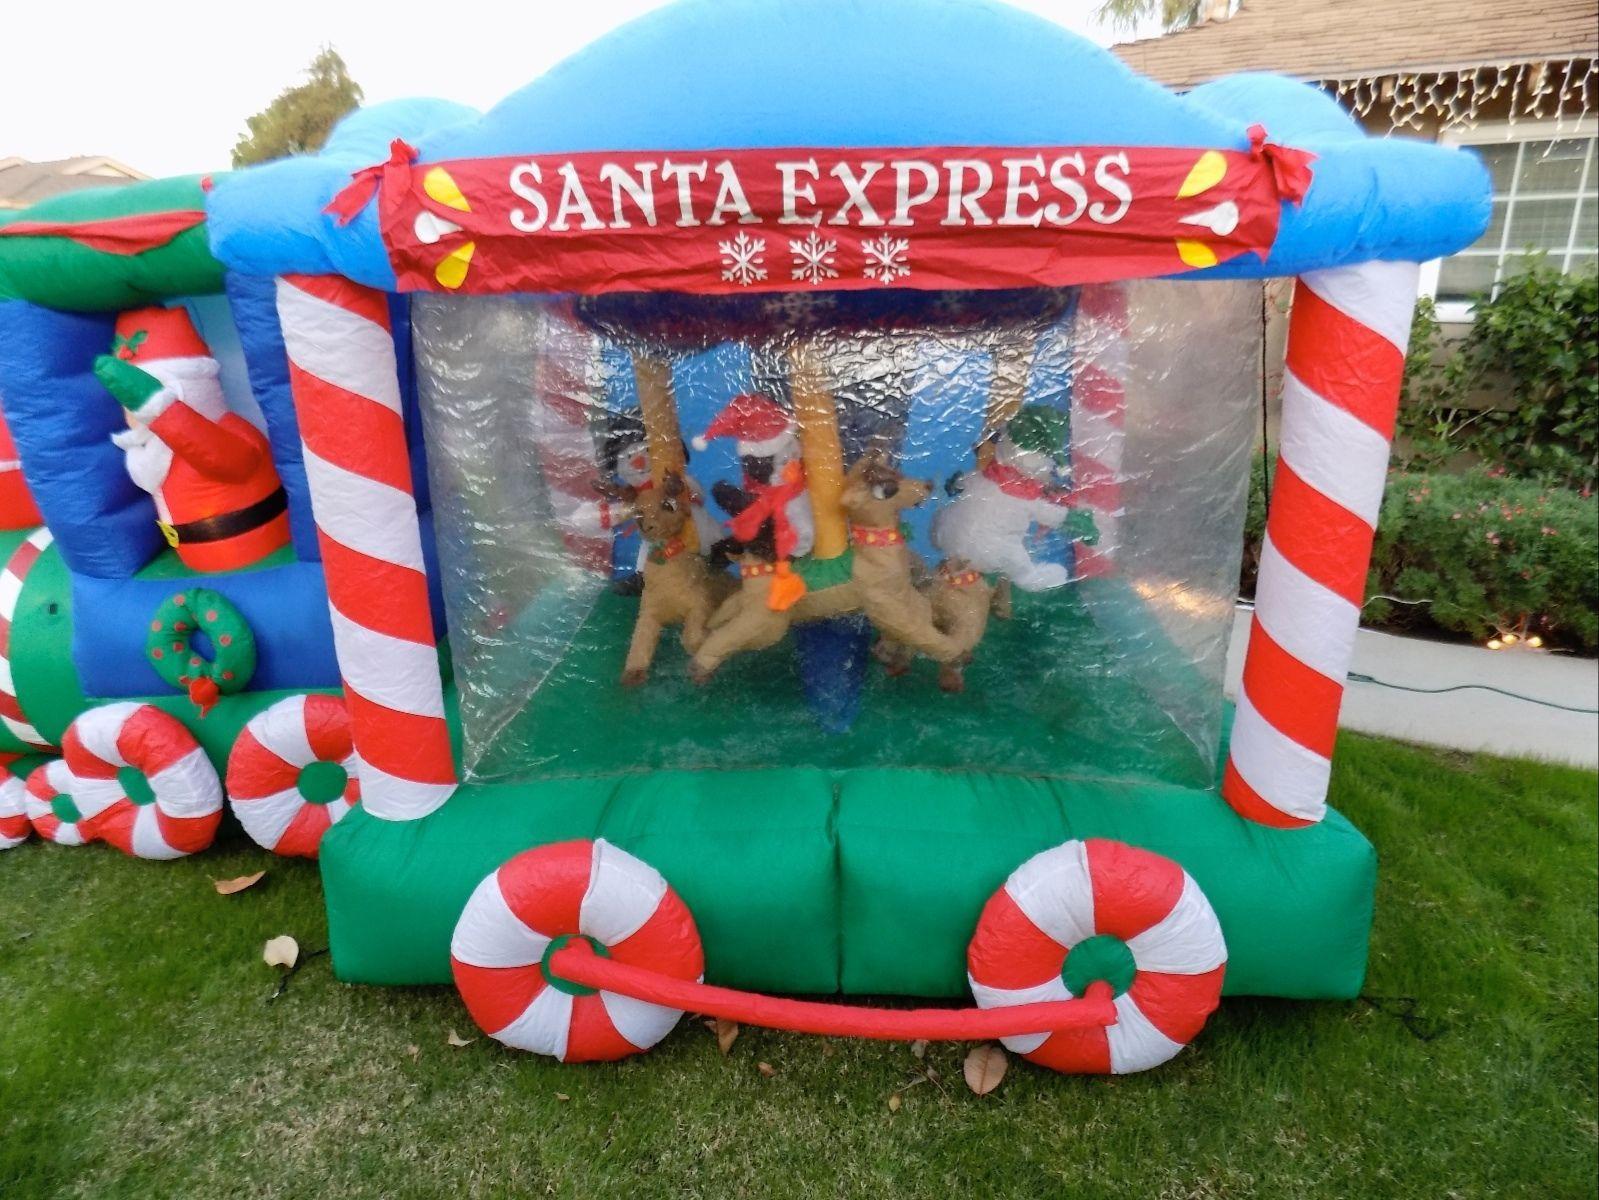 Http://www.ebay.com/itm/Gemmy-Christmas-Rotating-Santa